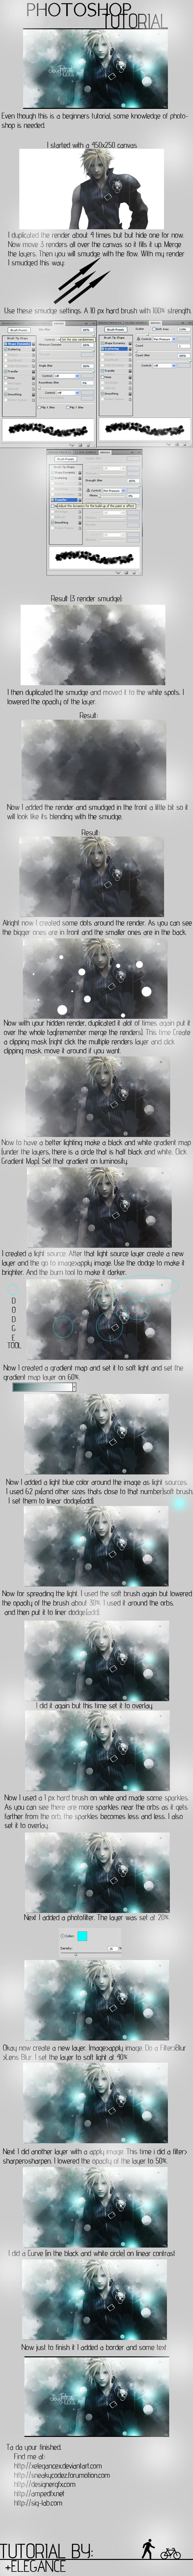 [Photoshop]Smudge Signature Cloud_signature_tutorial_by_xelegancex-d47u0lg